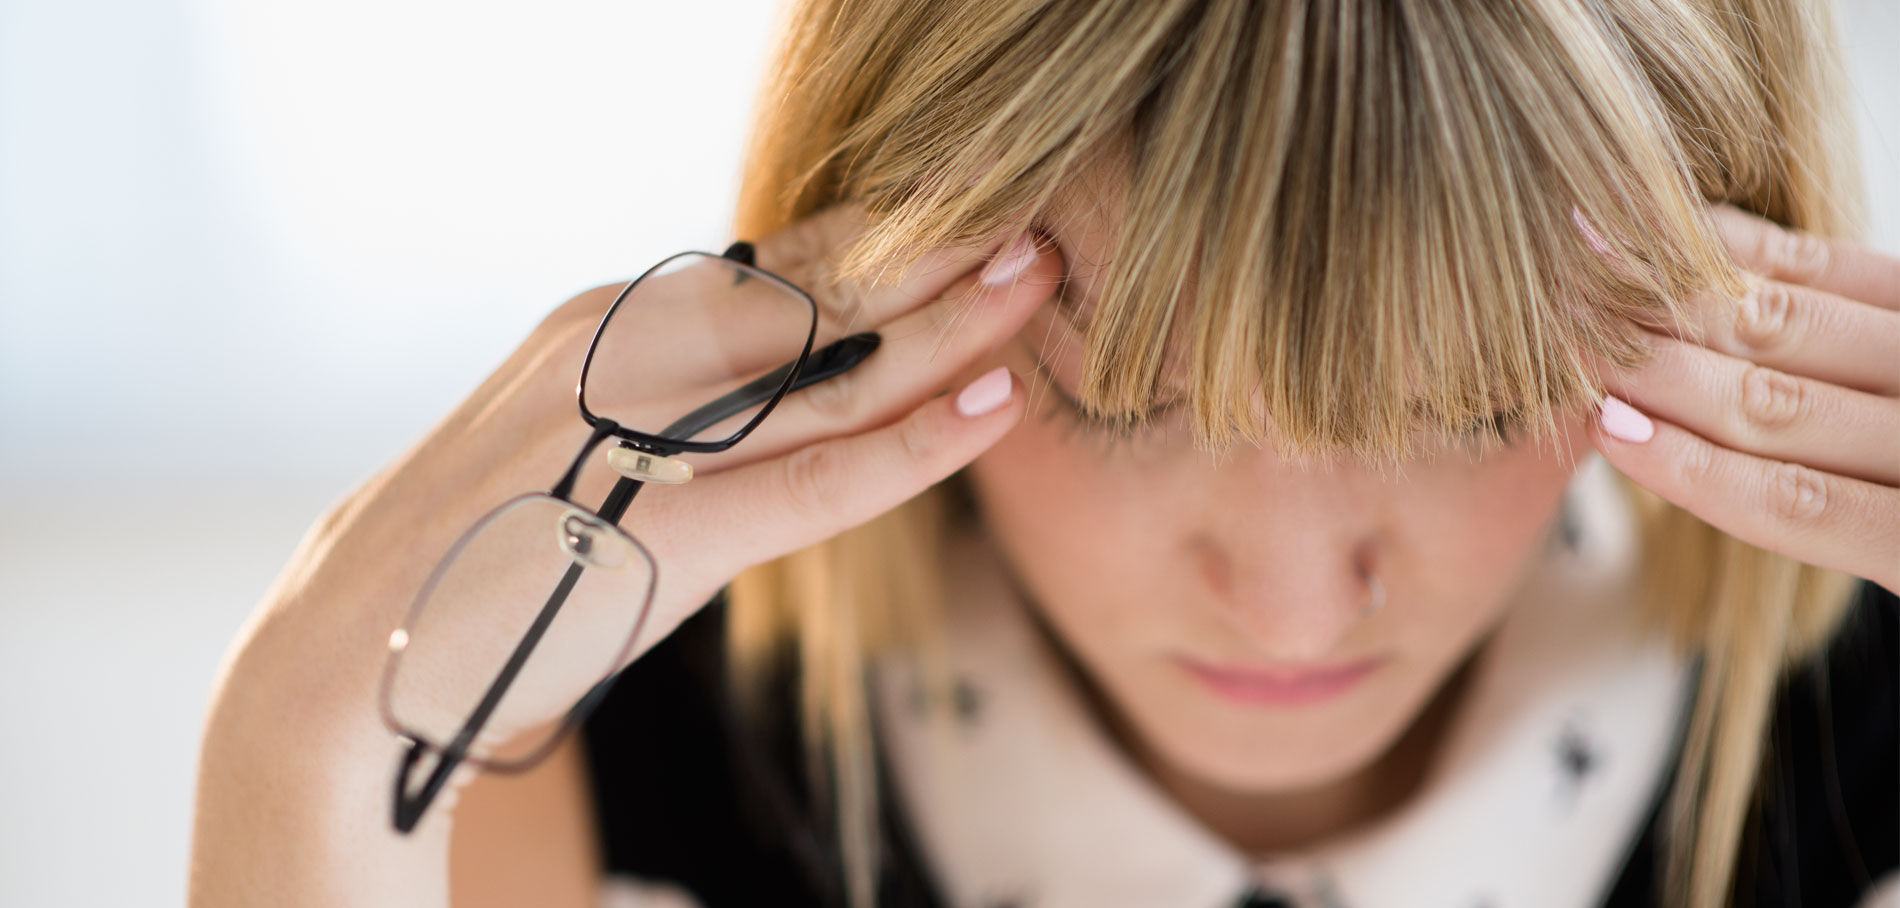 the noir migraine